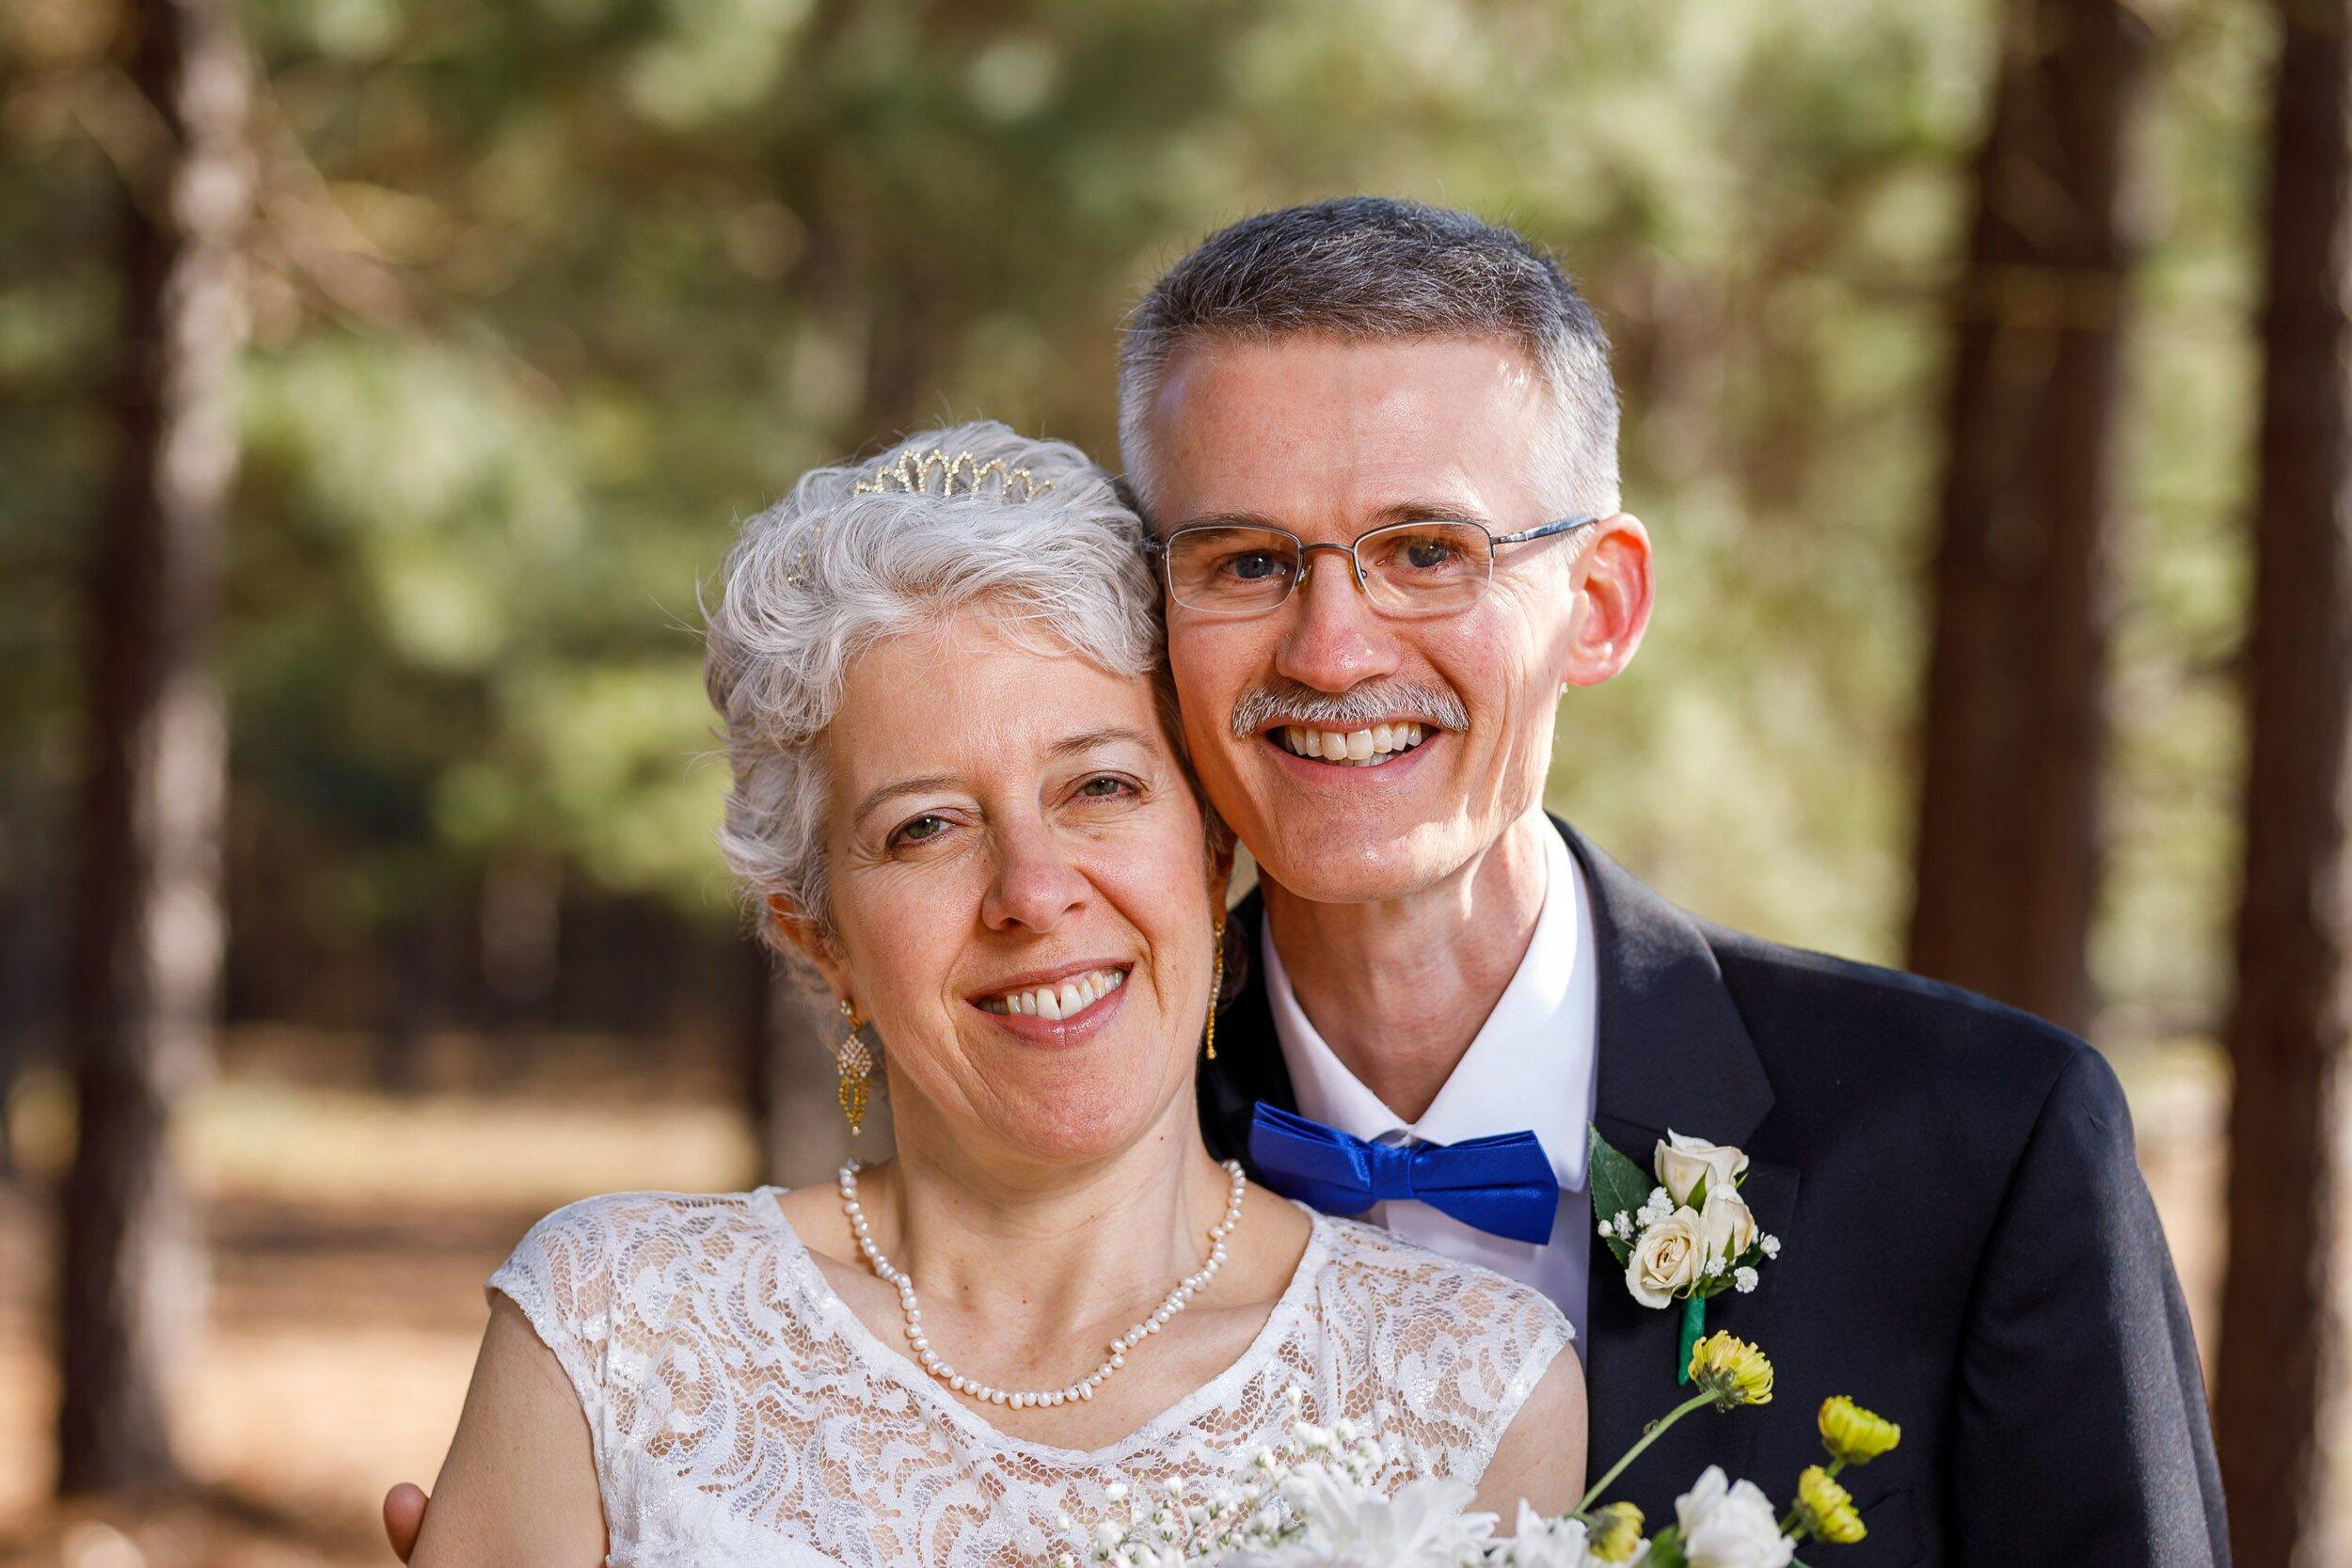 02-wedding-day-January-2017-compressor.jpg